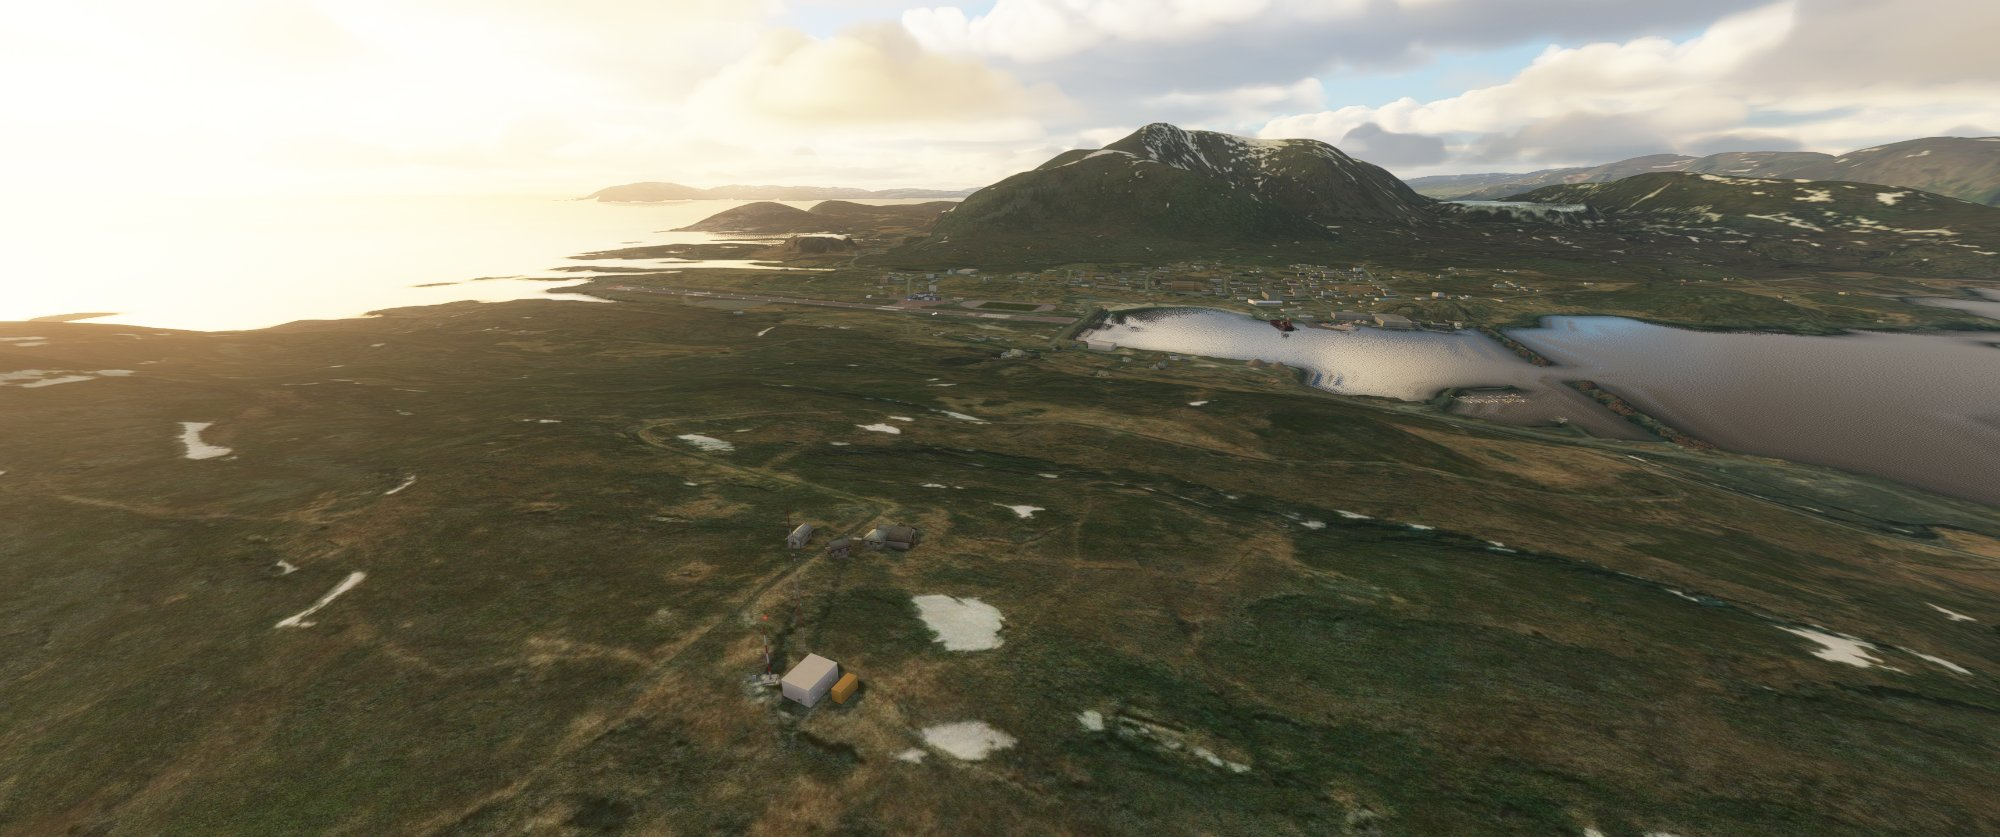 Microsoft Flight Simulator Screenshot 2020.11.19 - 15.46.24.69.jpg